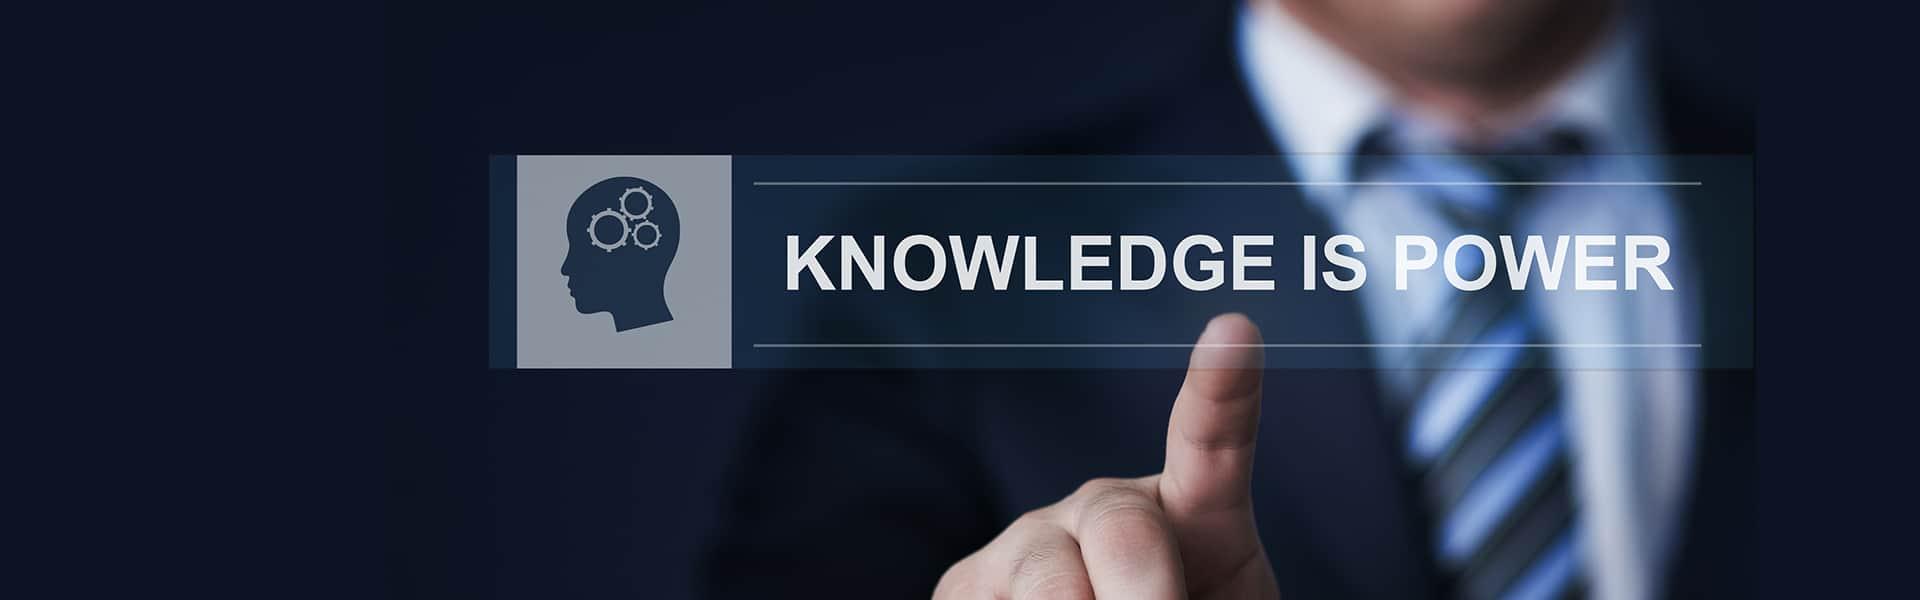 World Class Training Courses & Seminars